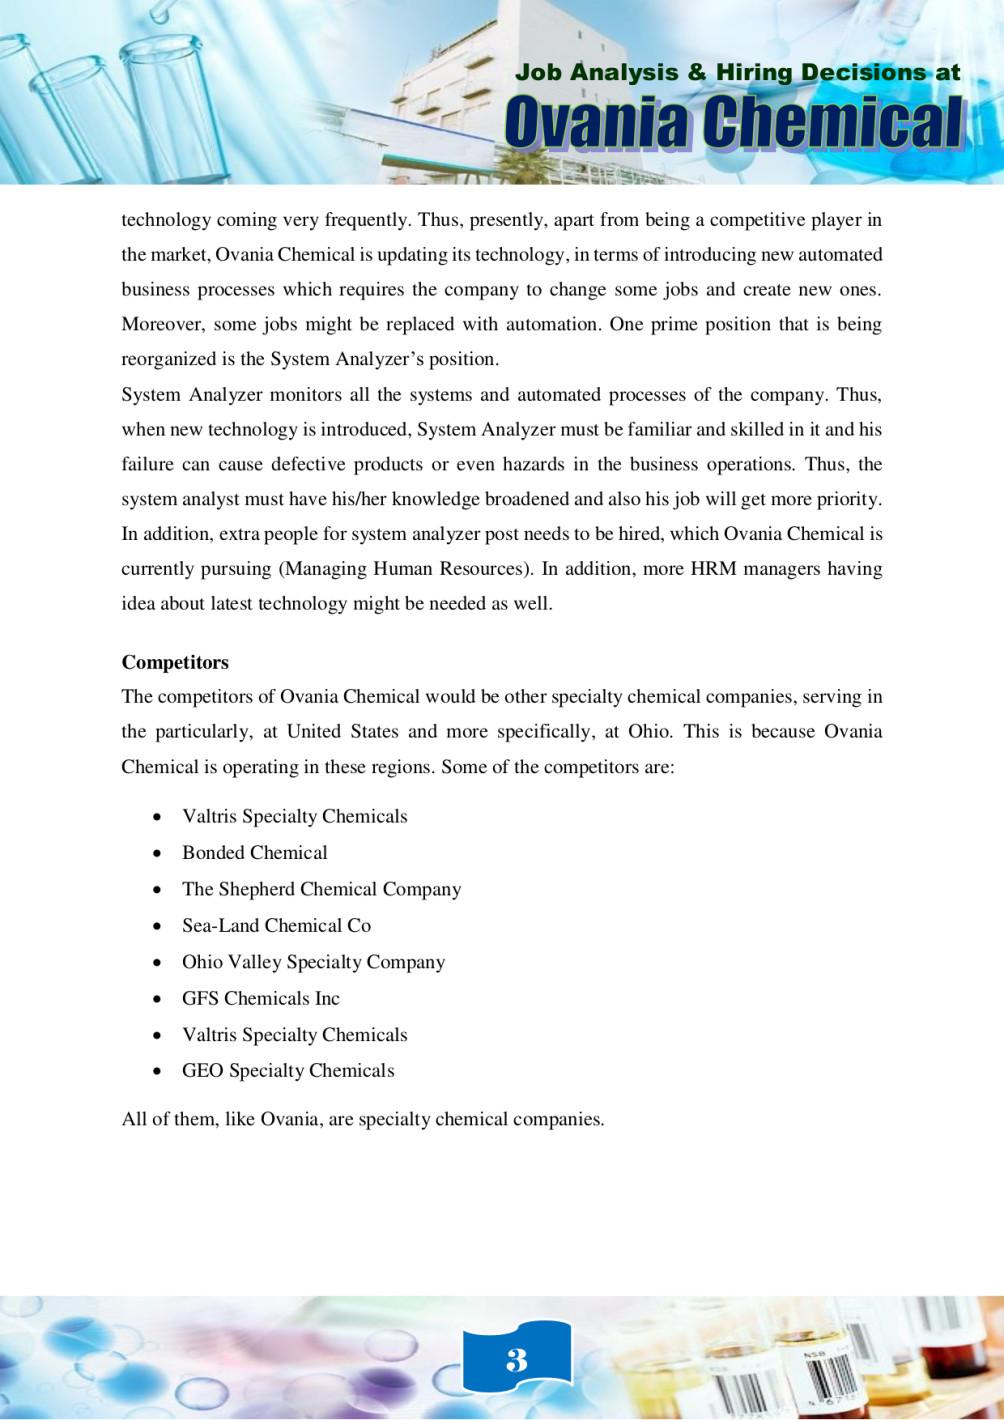 job analysis and hiring decisions at ovania chemical